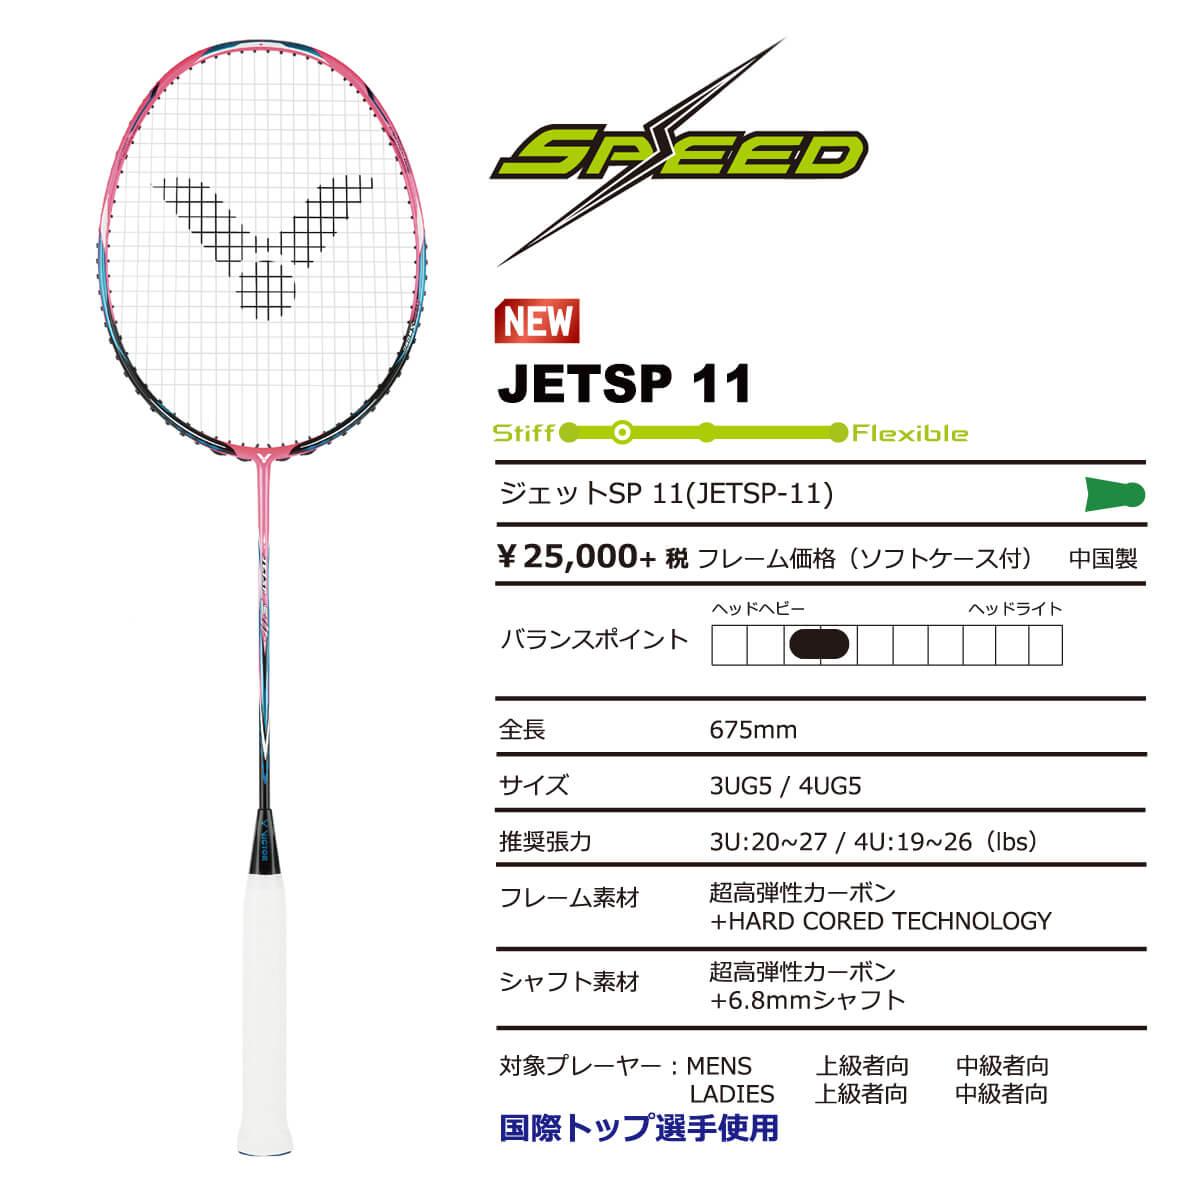 VICTOR JETSP 11 ジェットSP バドミントンラケット ビクター【日本バドミントン協会審査合格品/ 取り寄せ】